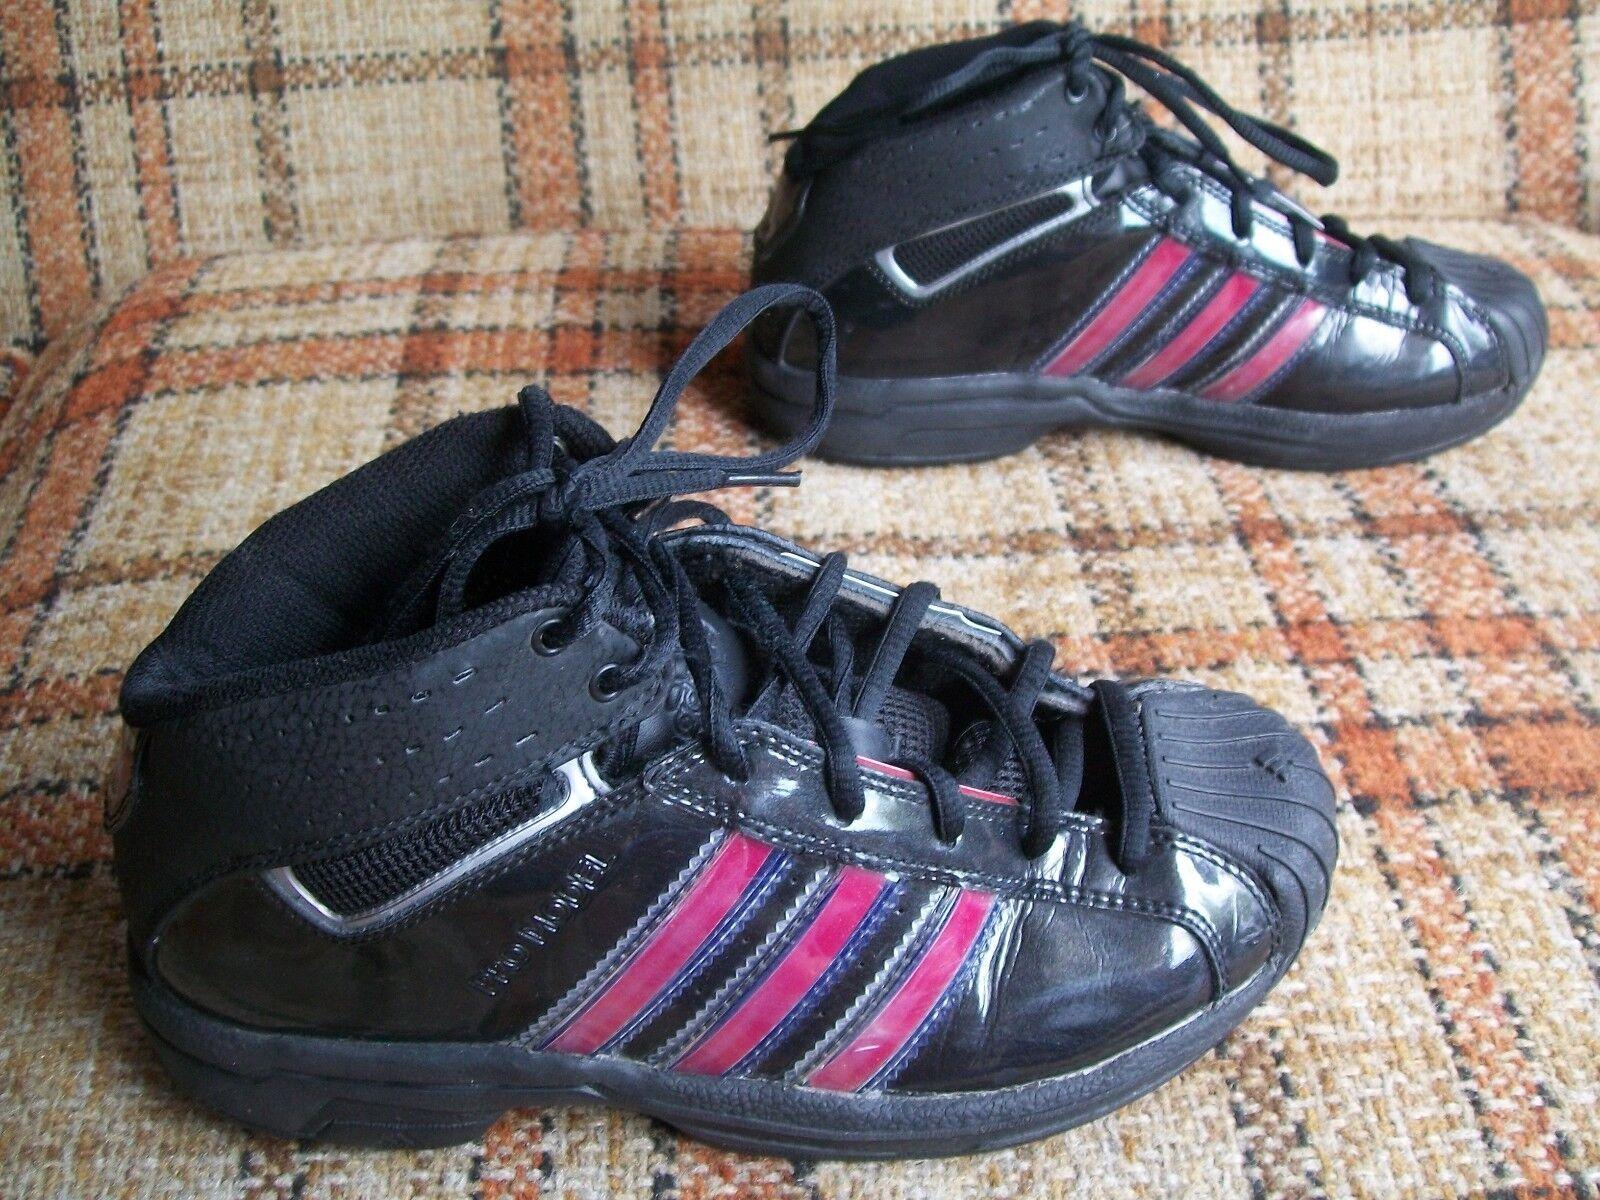 Adidas Model Mens Size 5 (FR 37 1/3) Pro Model Adidas Black/Red Basketball Hightops 043694 1c7b95